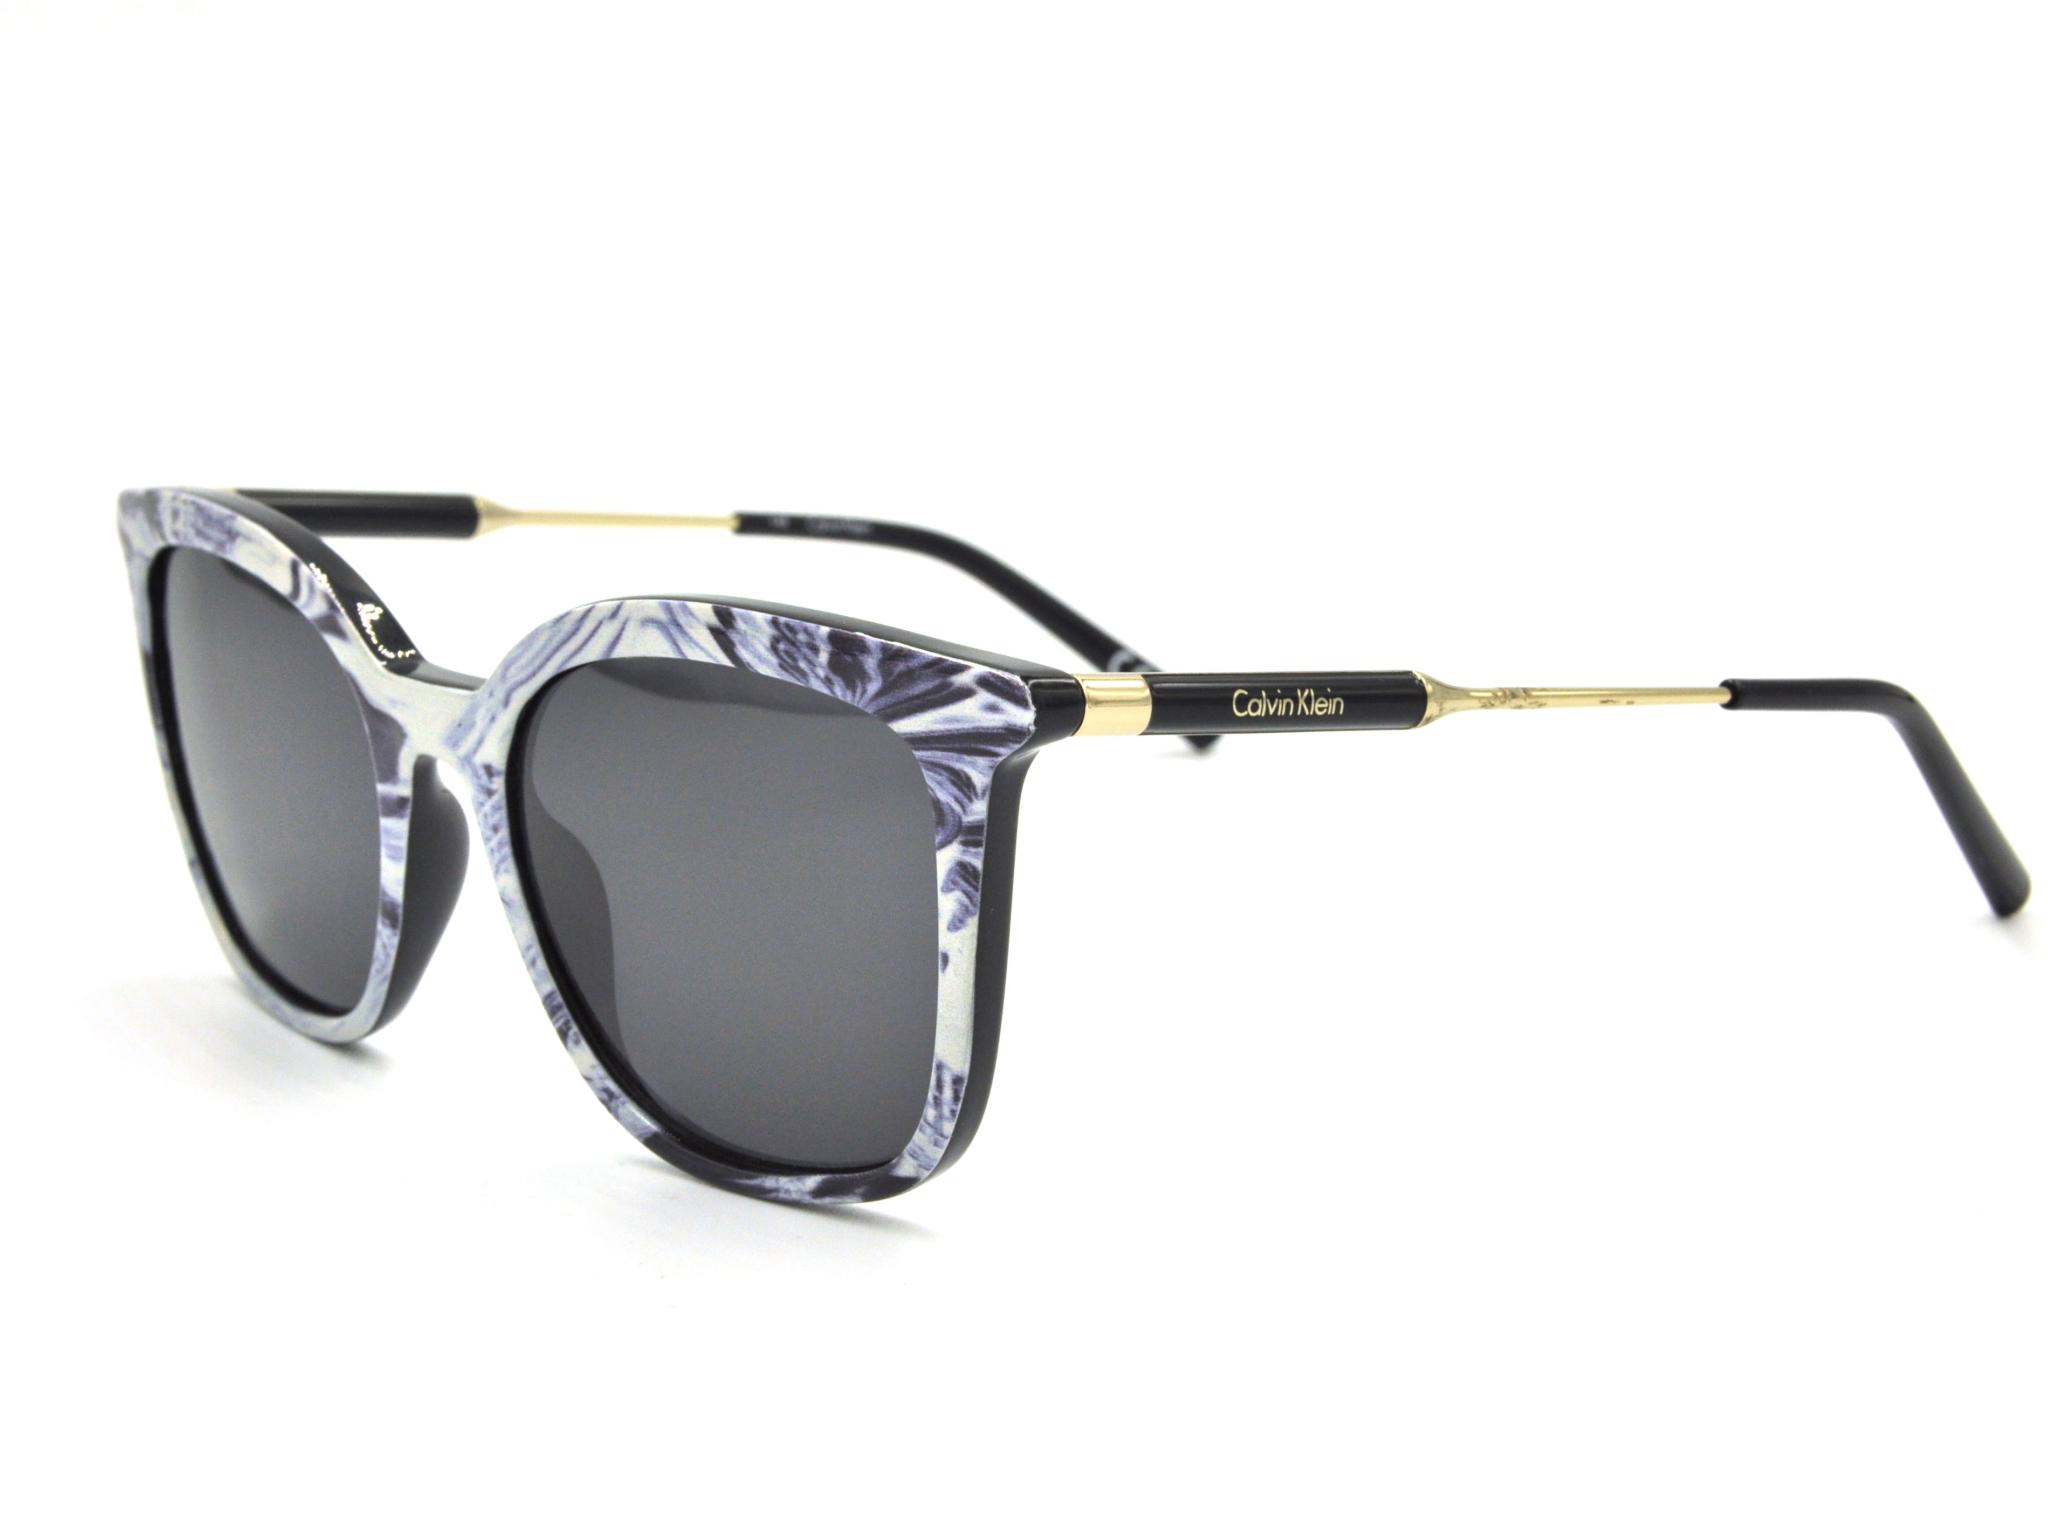 CALVIN KLEIN CK3204S 109 Sunglasses 2020